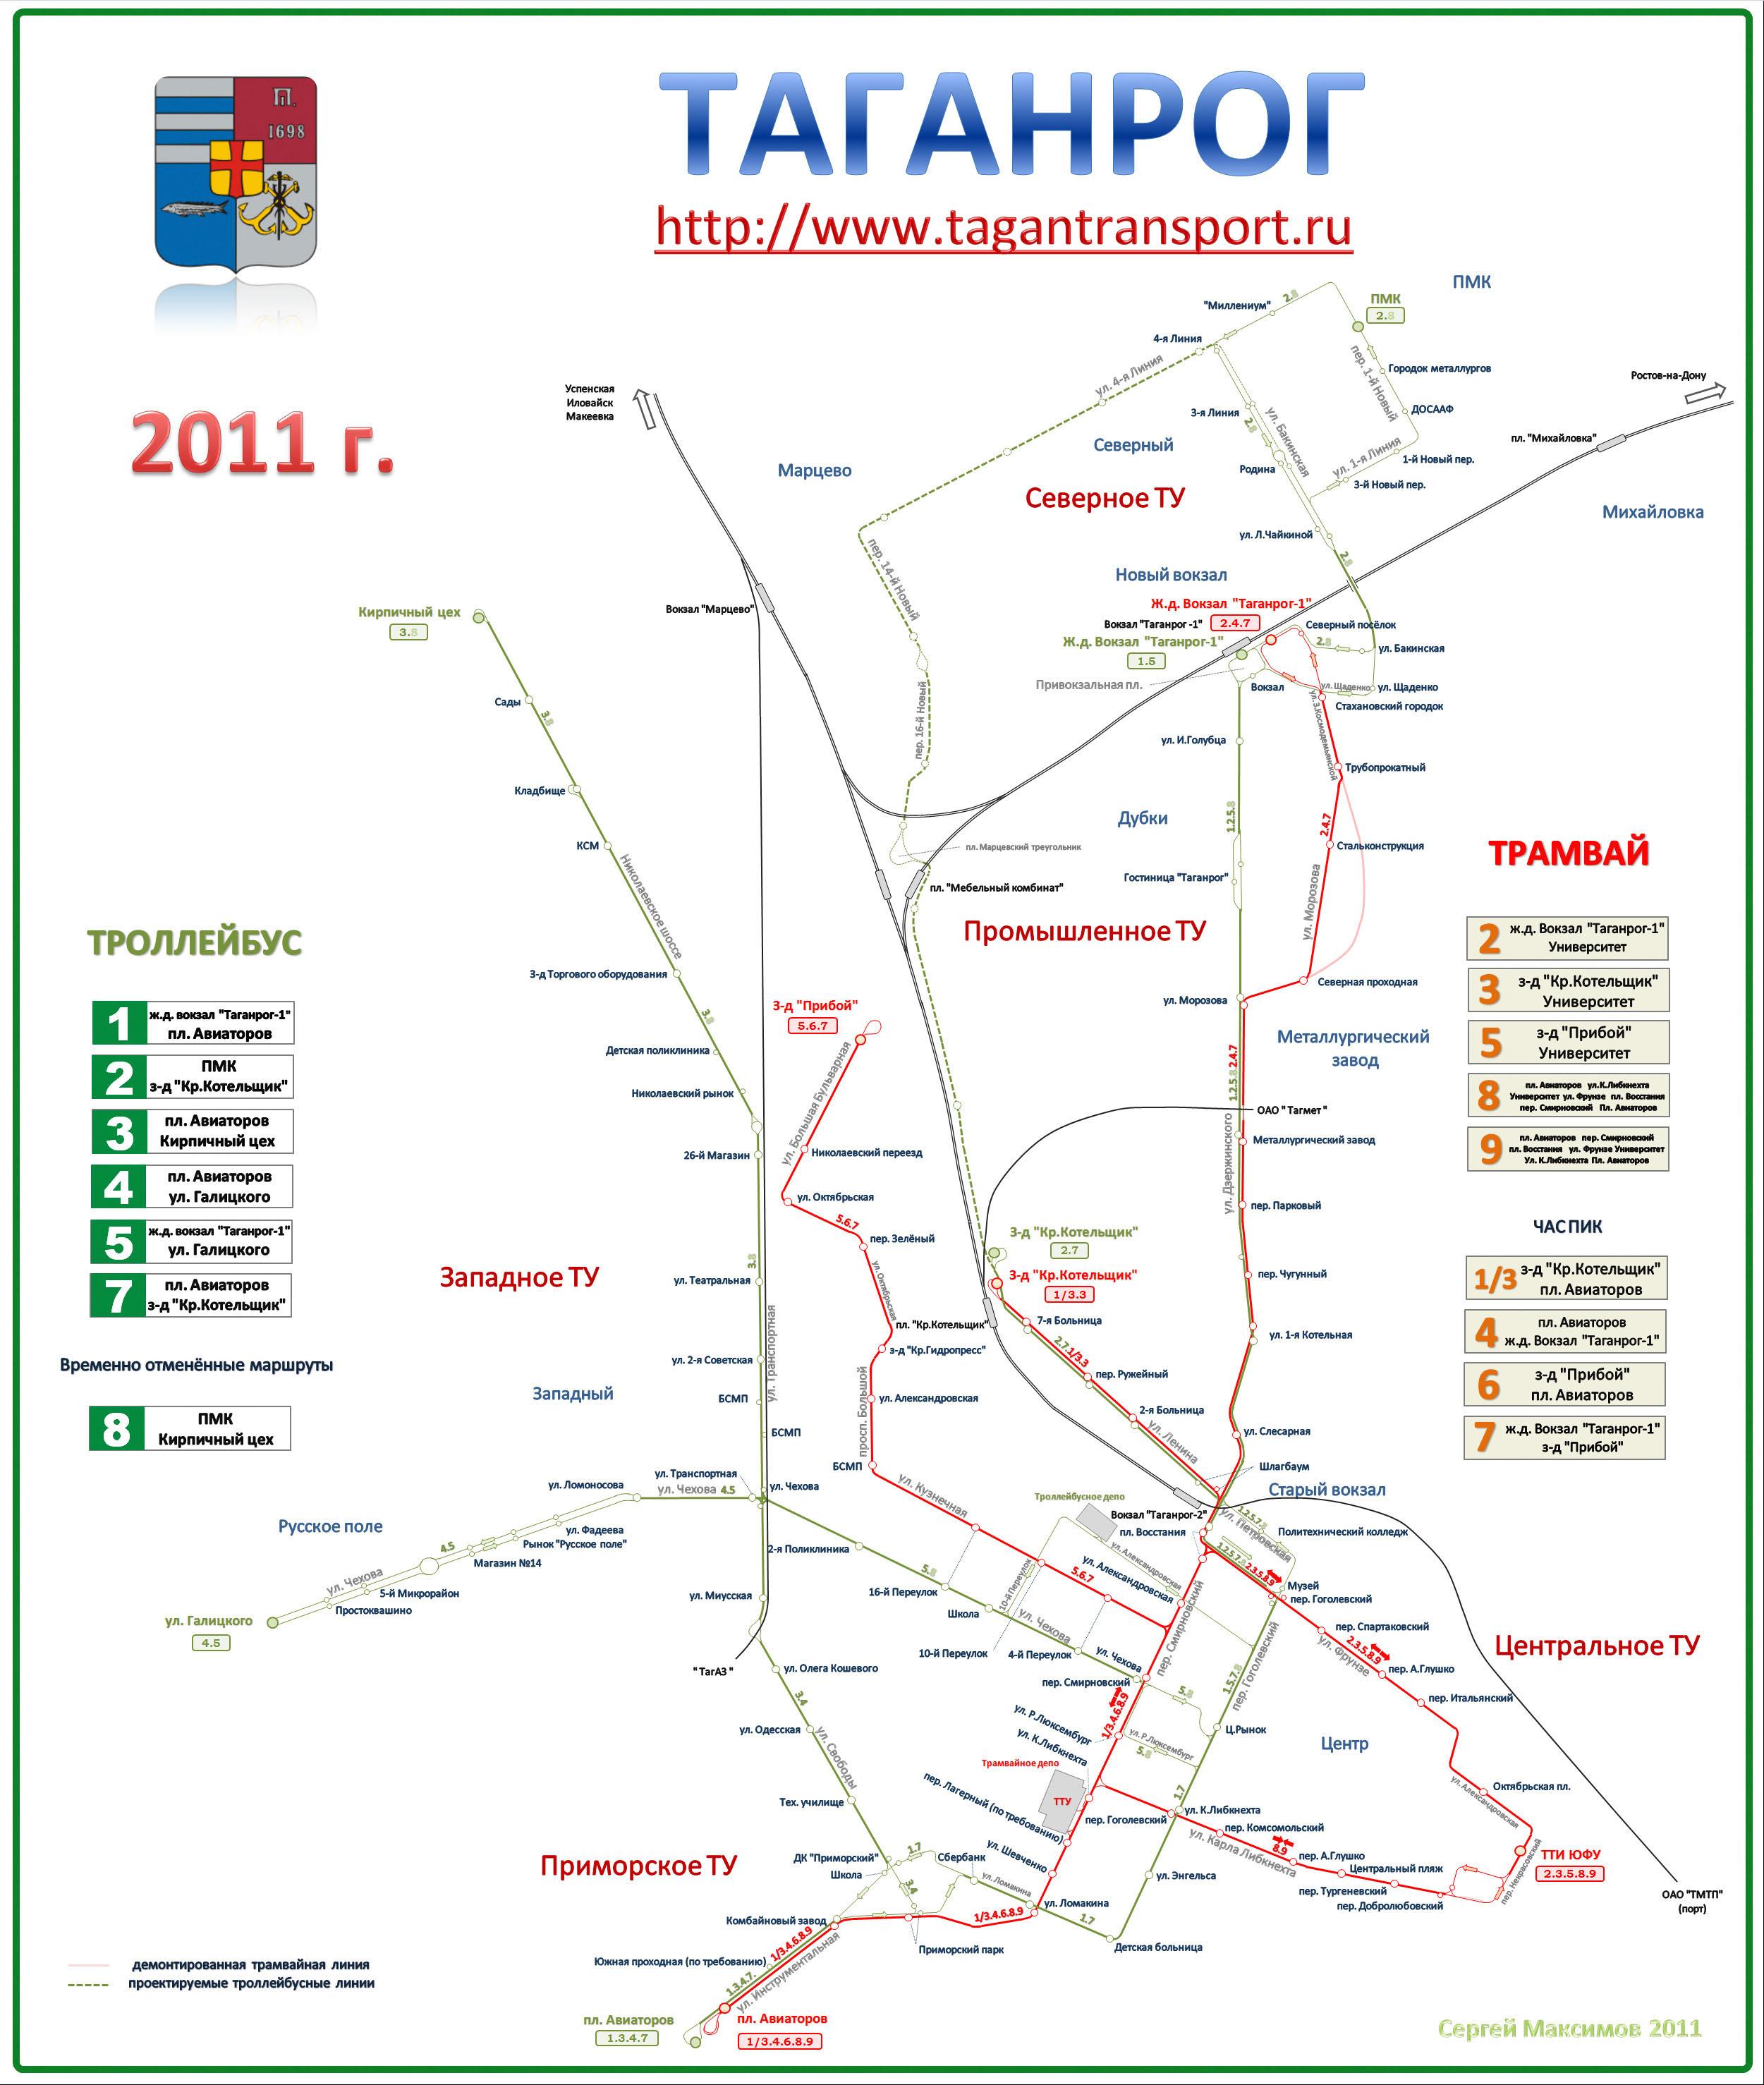 Таганрог. Схема маршрутов электротранспорта Таганрога по состоянию на август 2011 года